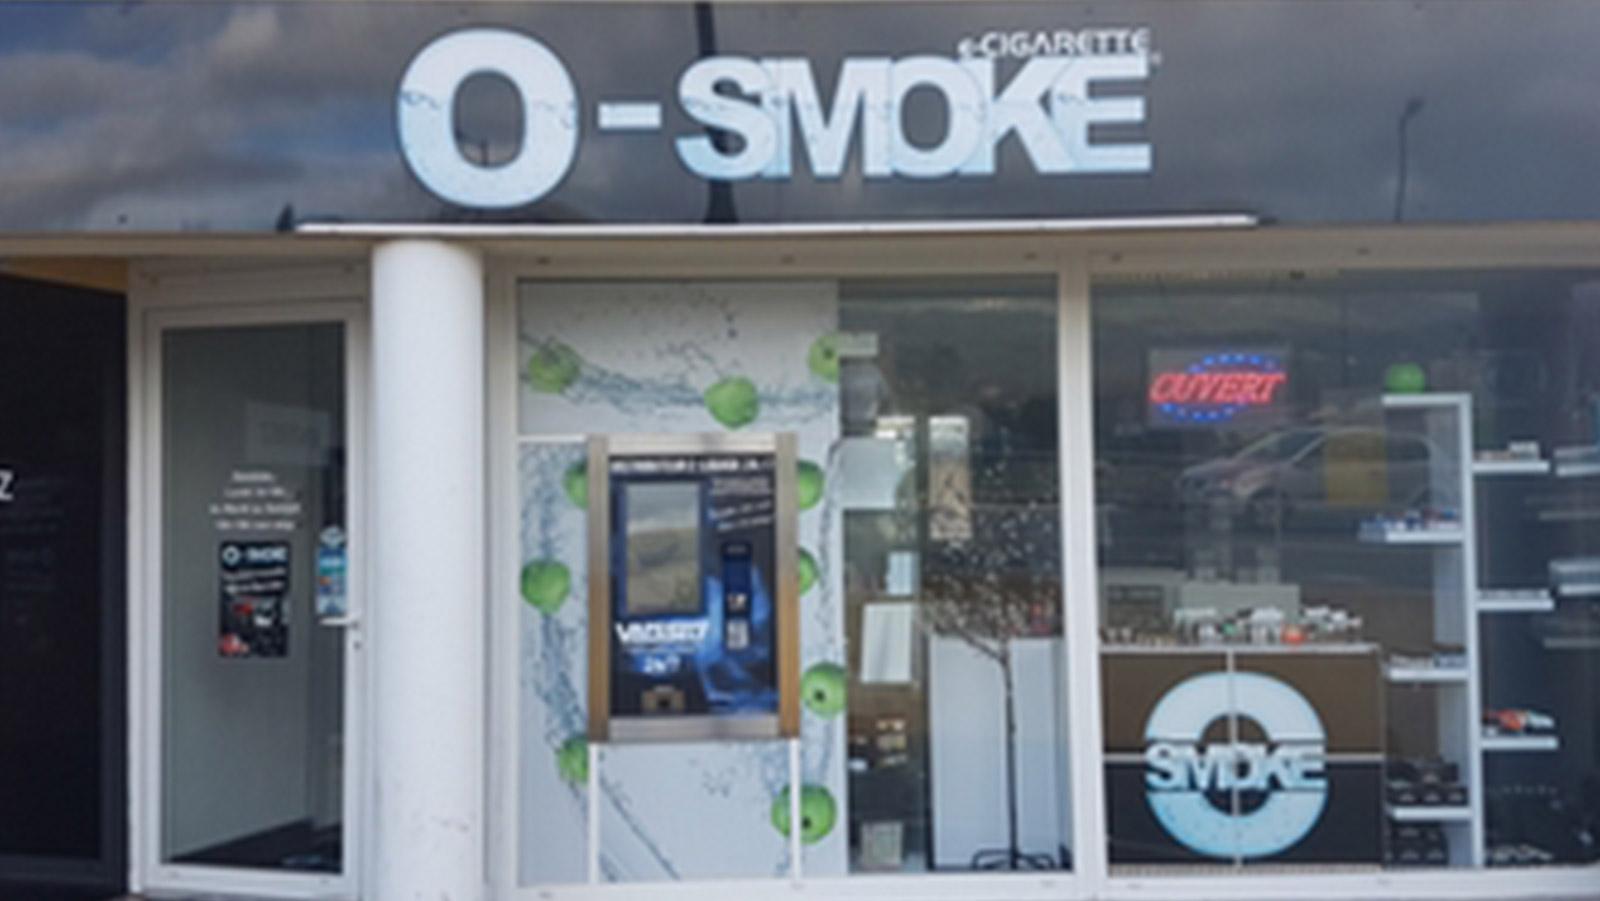 magasin O'smoke Grasse